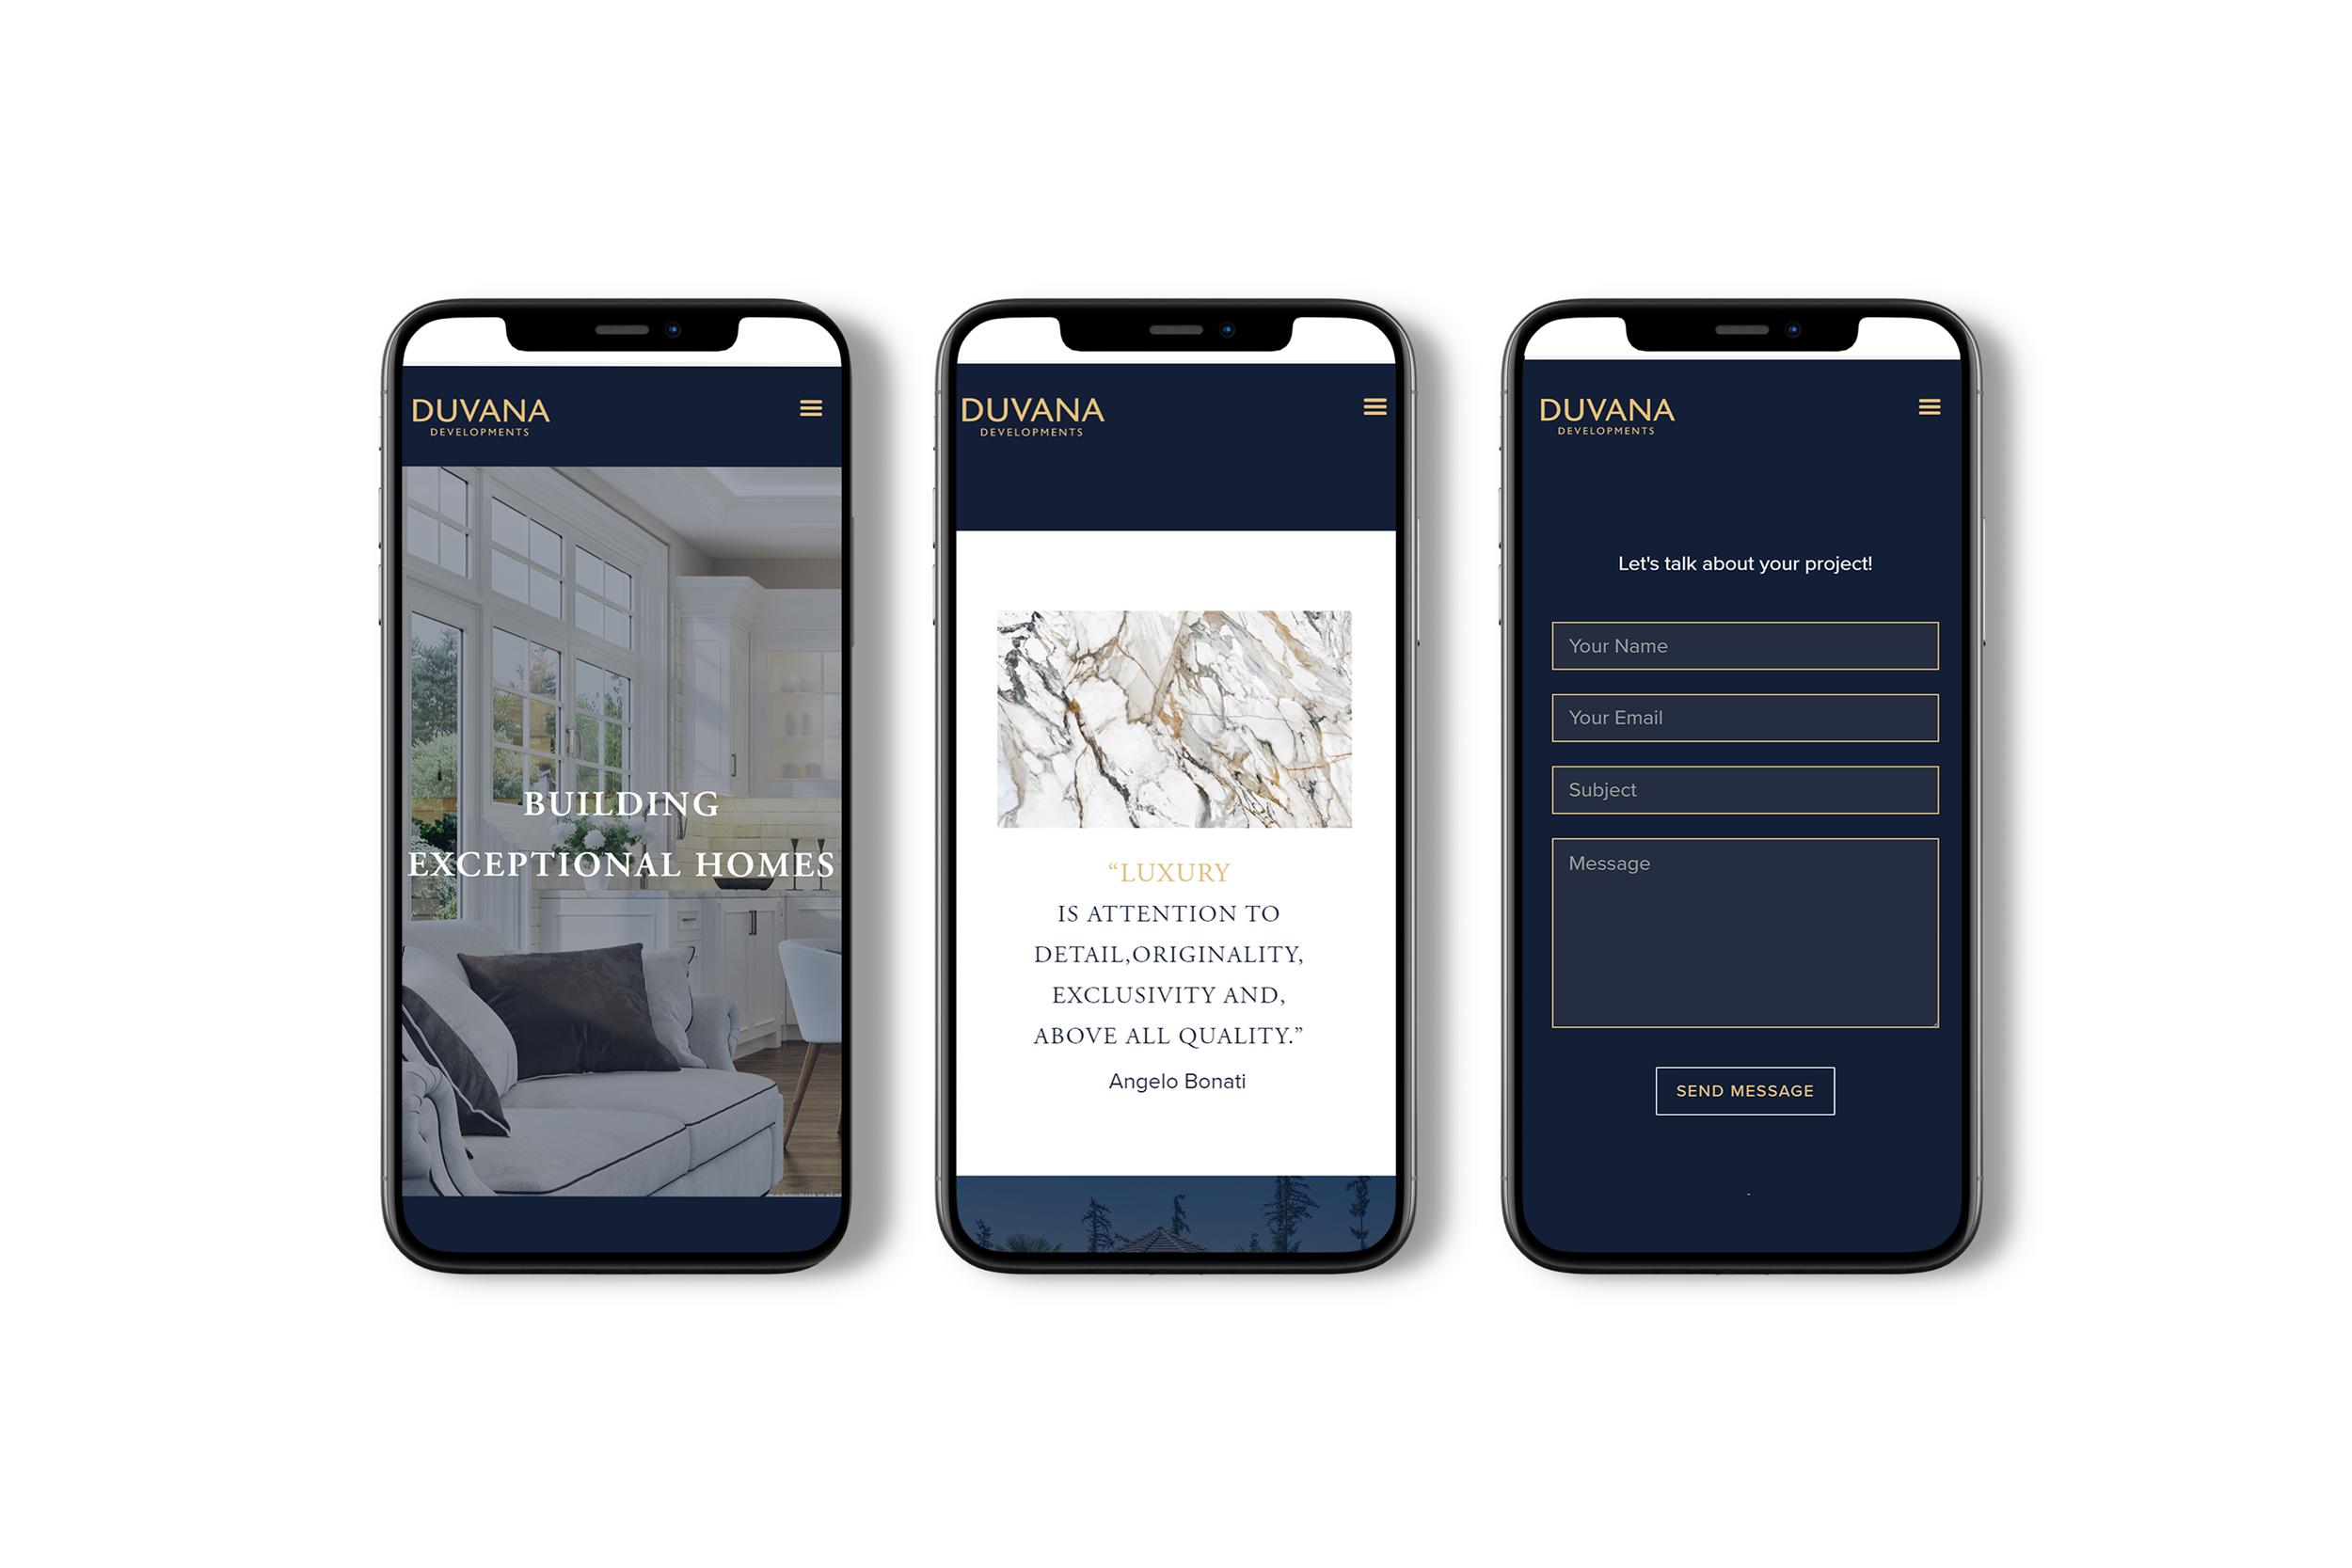 iphone mockup of a web design.